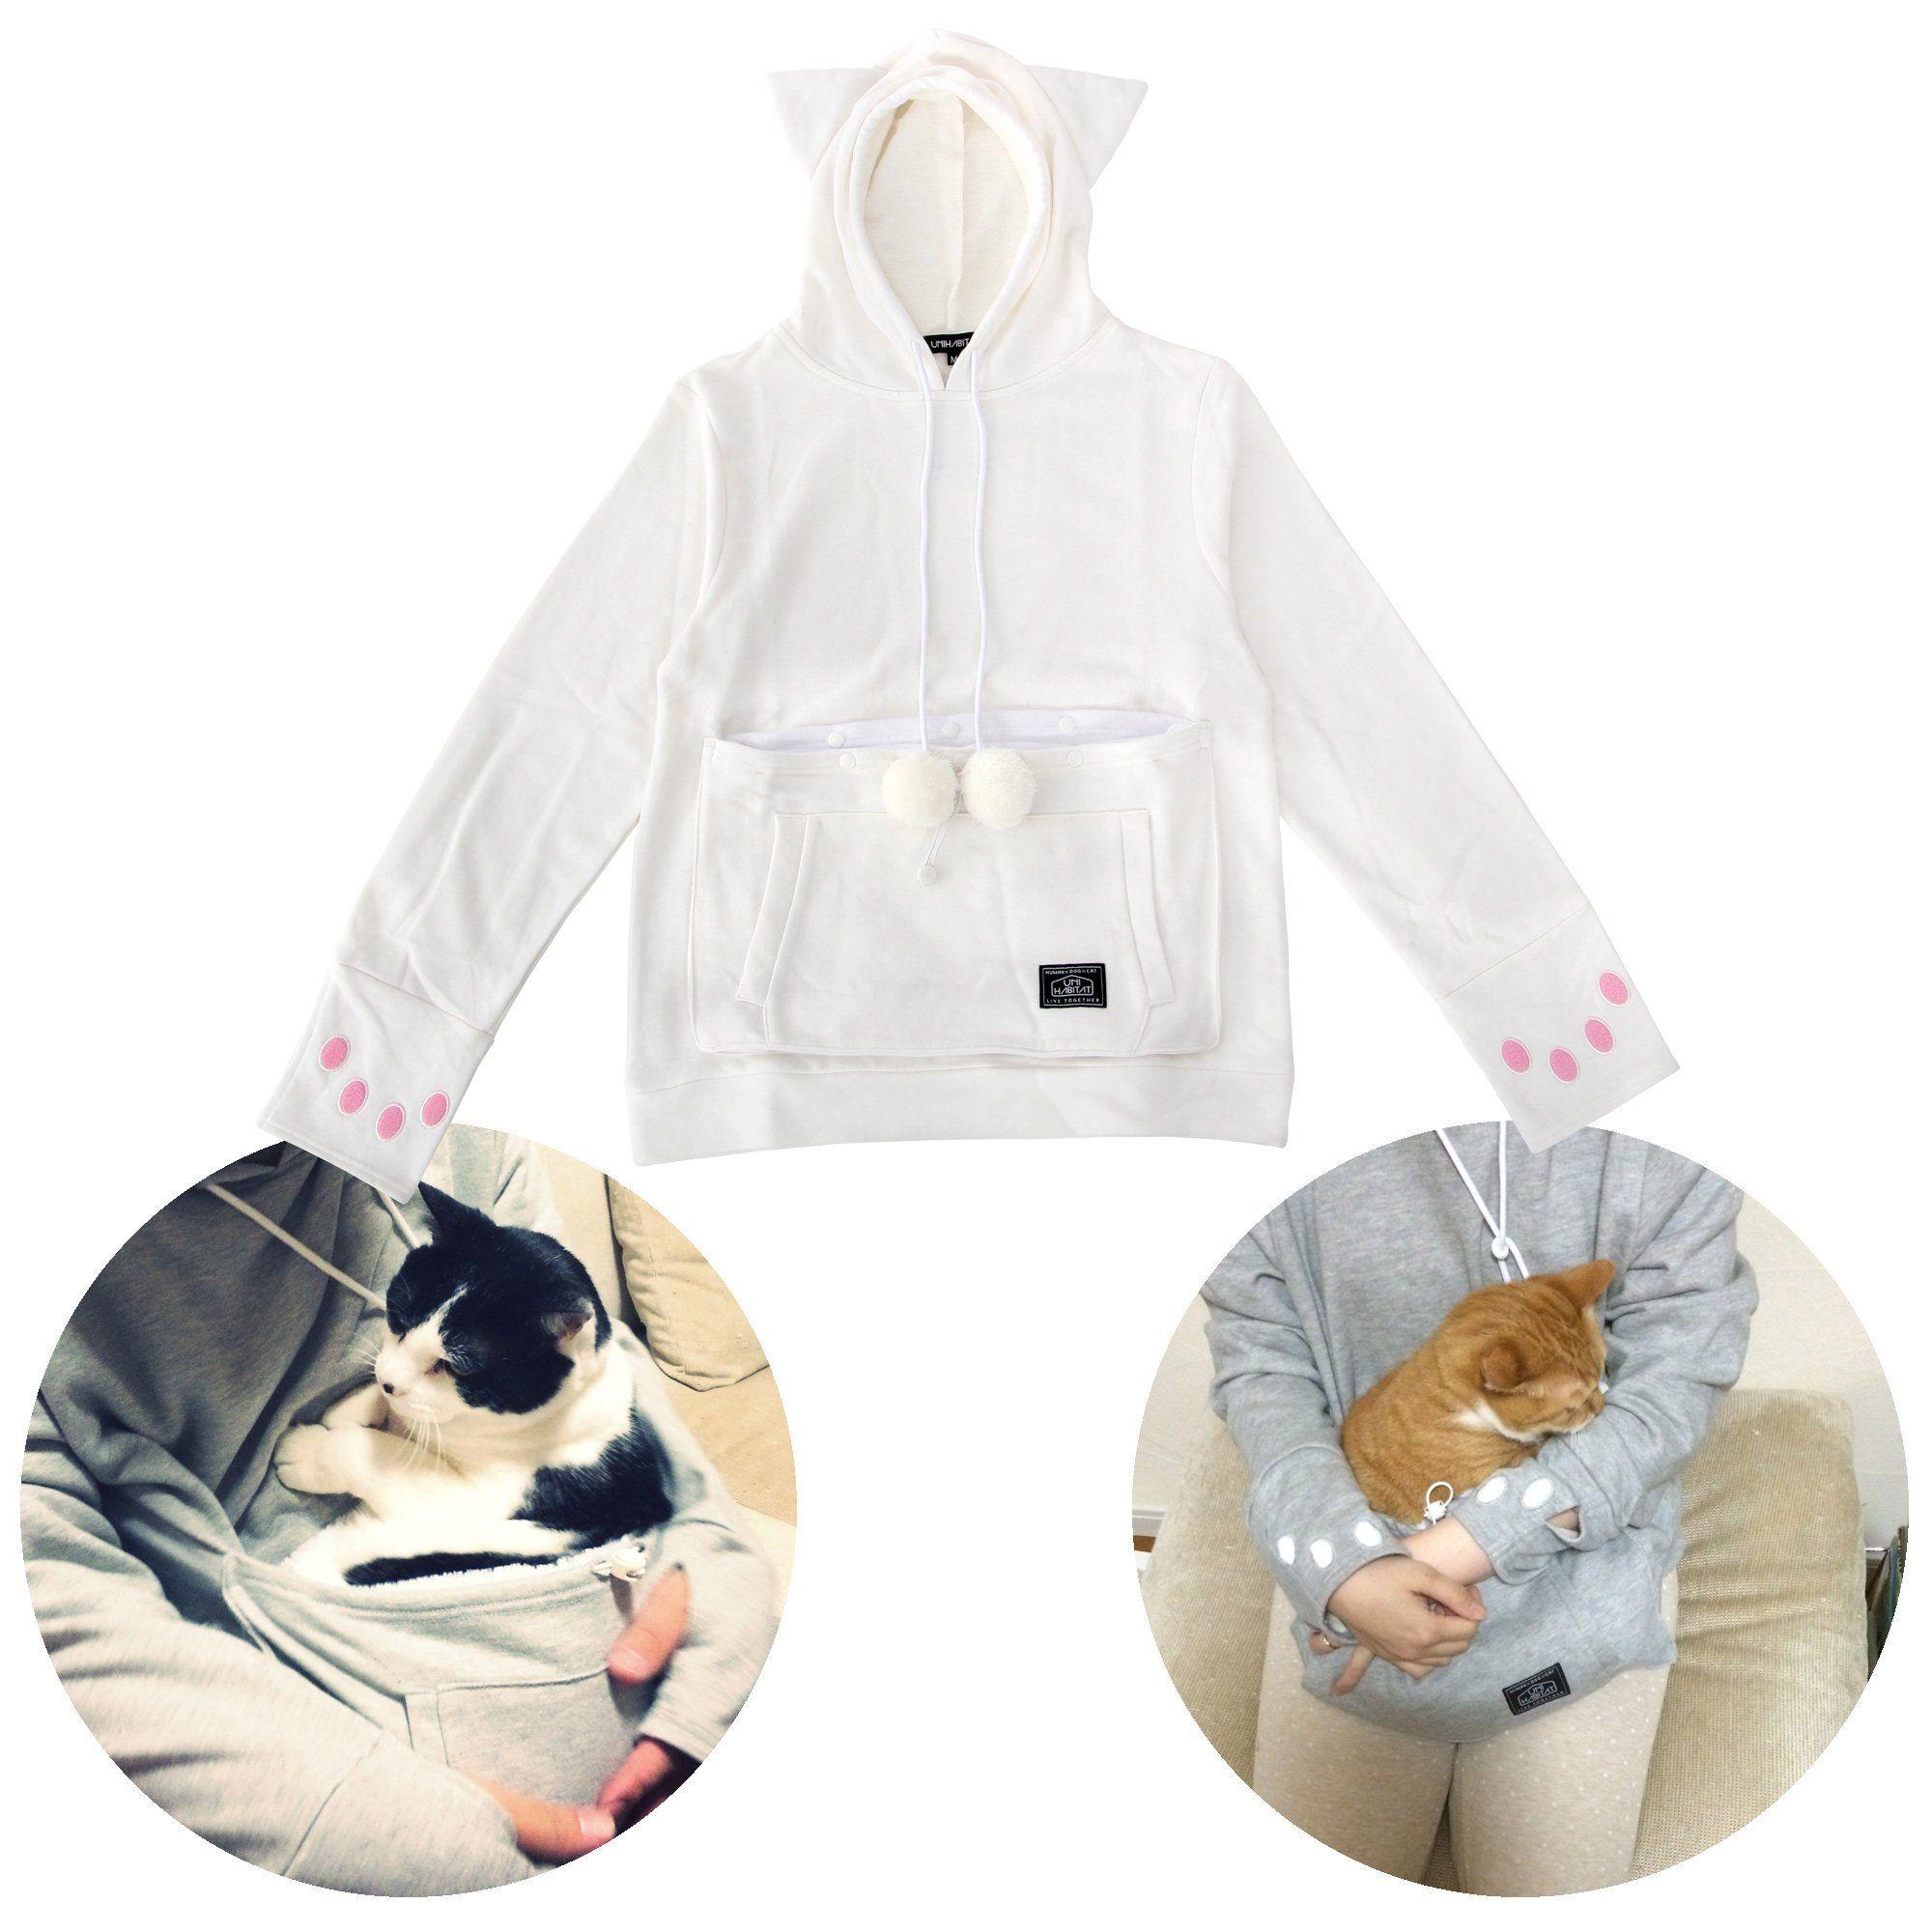 Mewgaroo Hoodie Upa32mwh White Cat Shaped Sweat with Ears